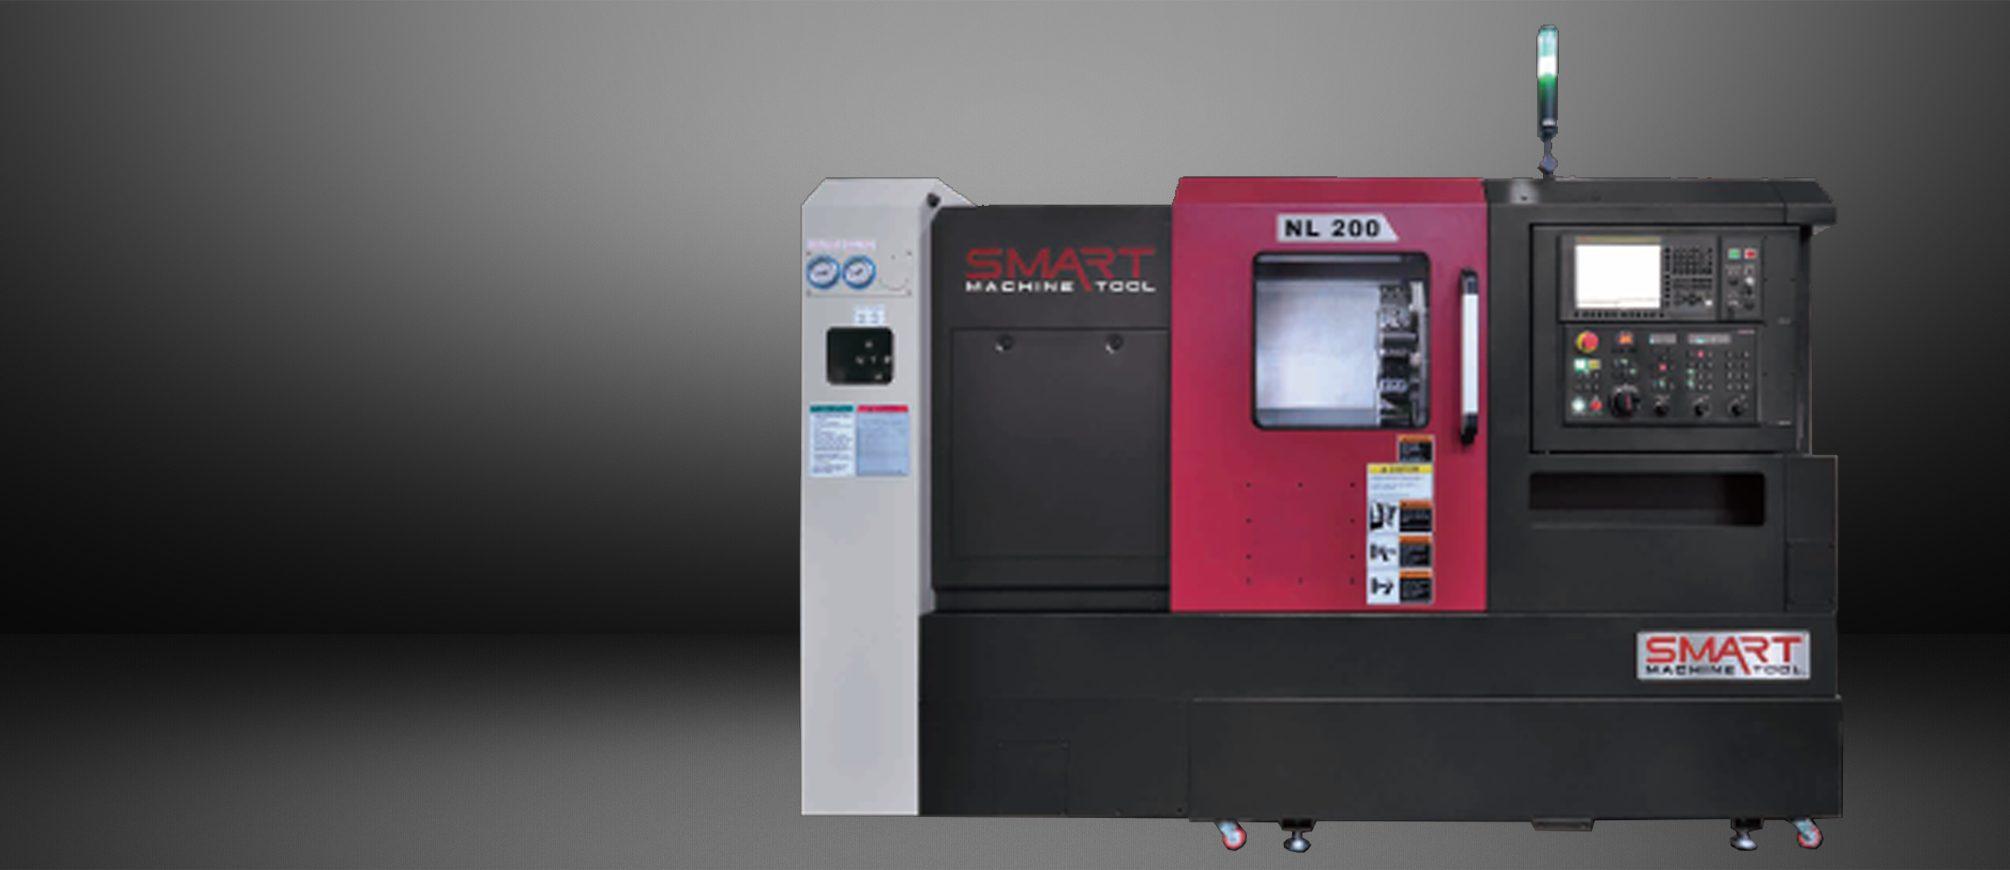 SMART NL 200 – BOX WAY – (8″ CHUCK) 2-Axis CNC Lathes